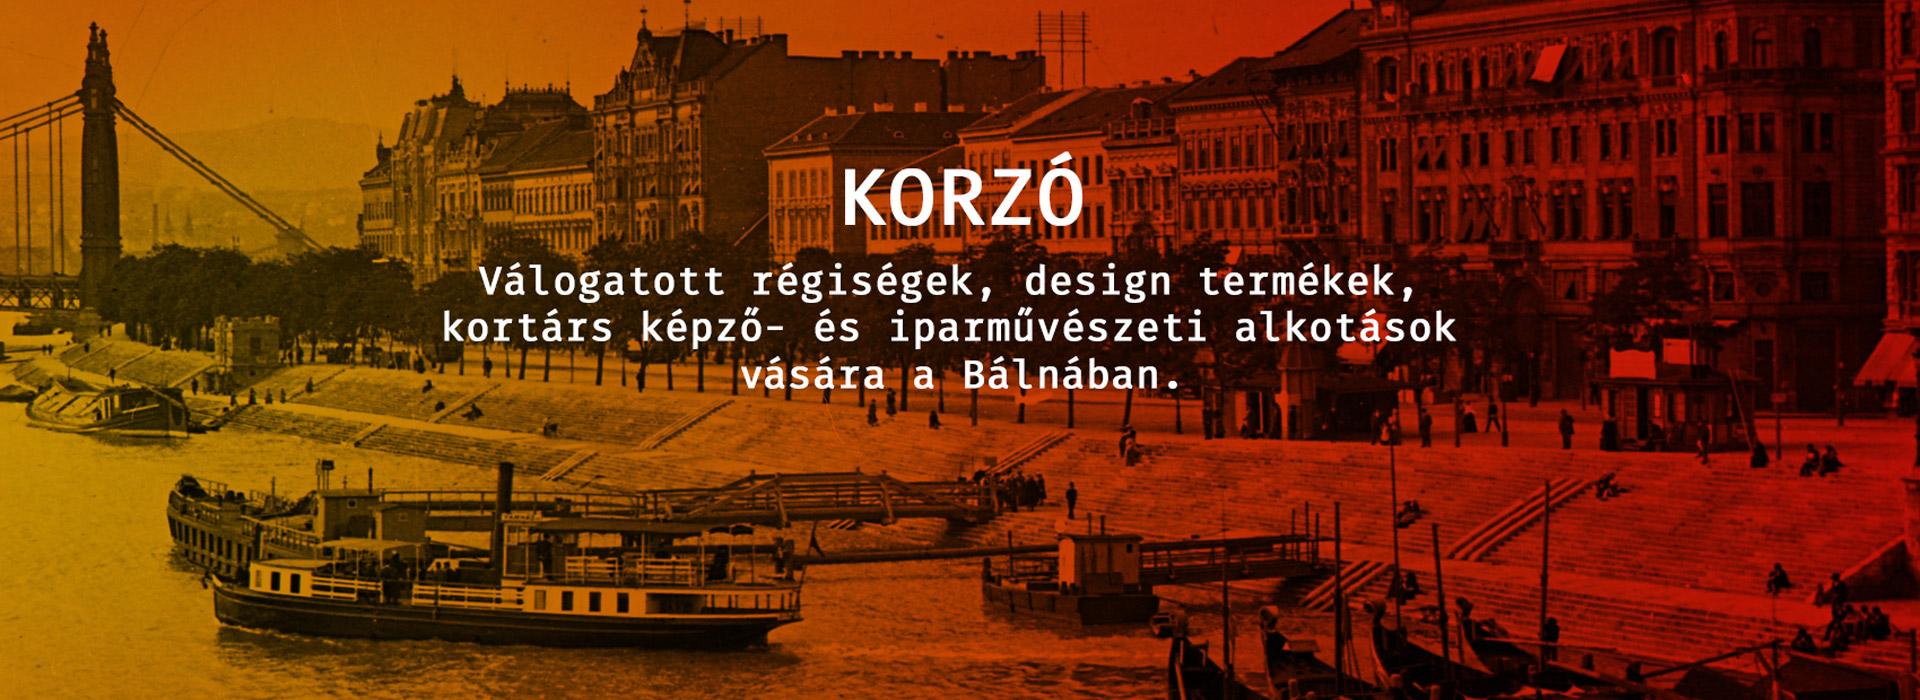 2015-balna-korzo-1920